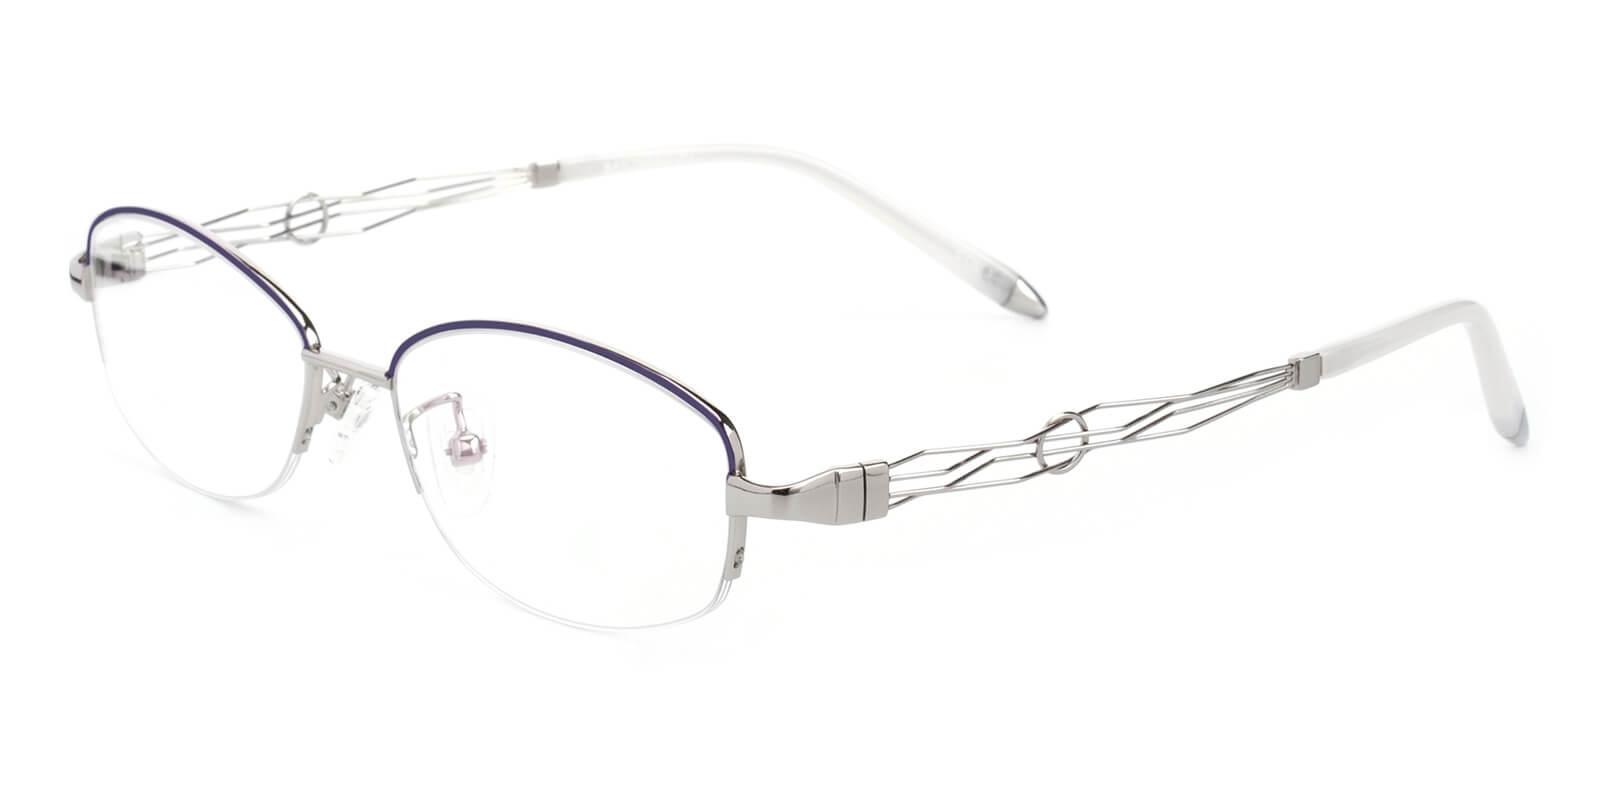 Grid-Silver-Oval-Metal-Eyeglasses-additional1